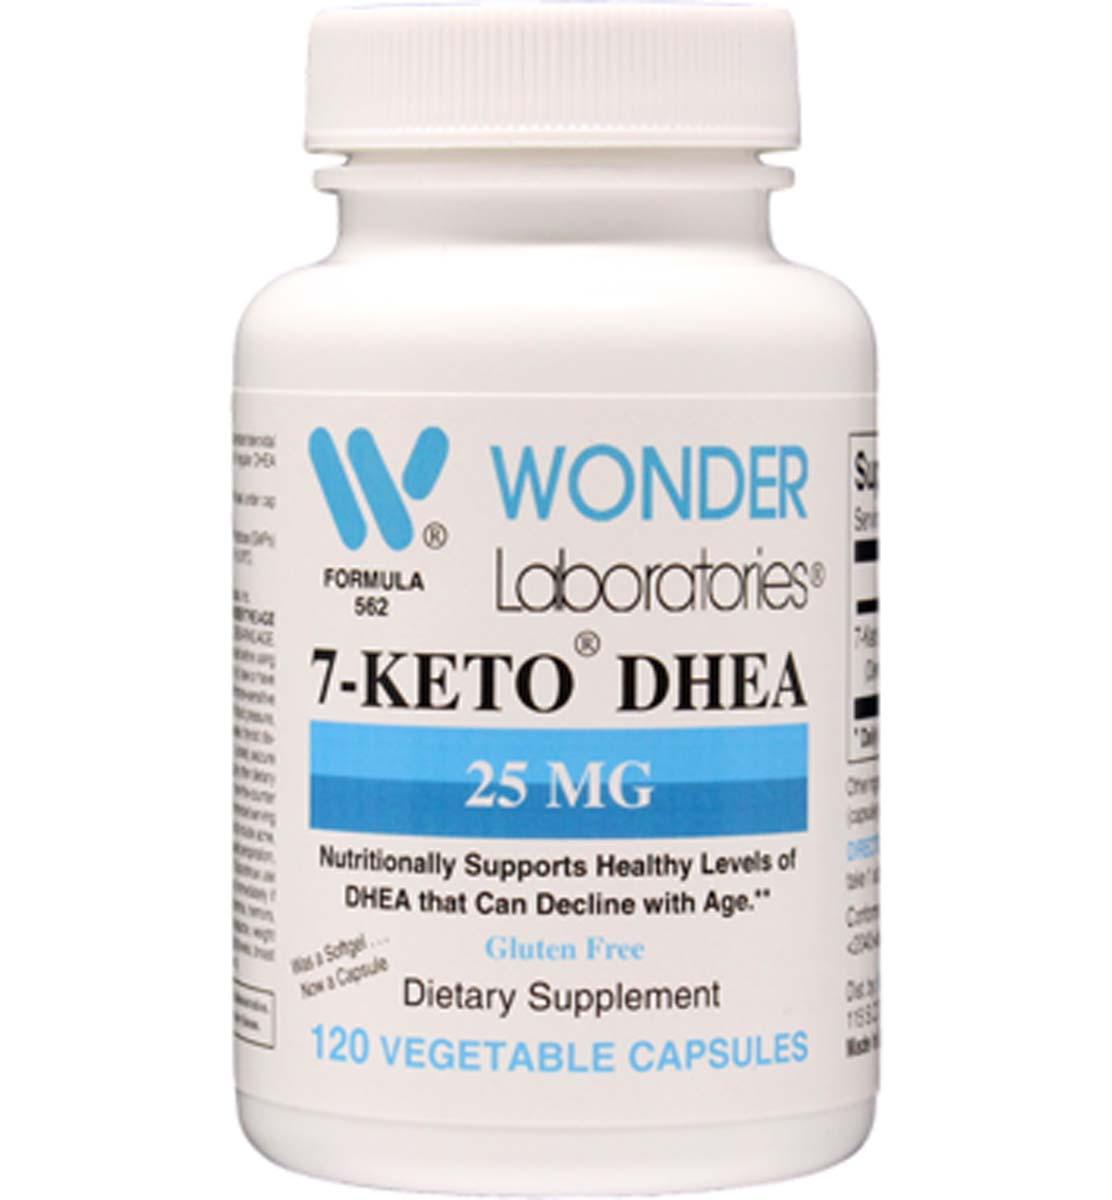 7-Keto DHEA 25 mg 120 Softgels - Item 5621